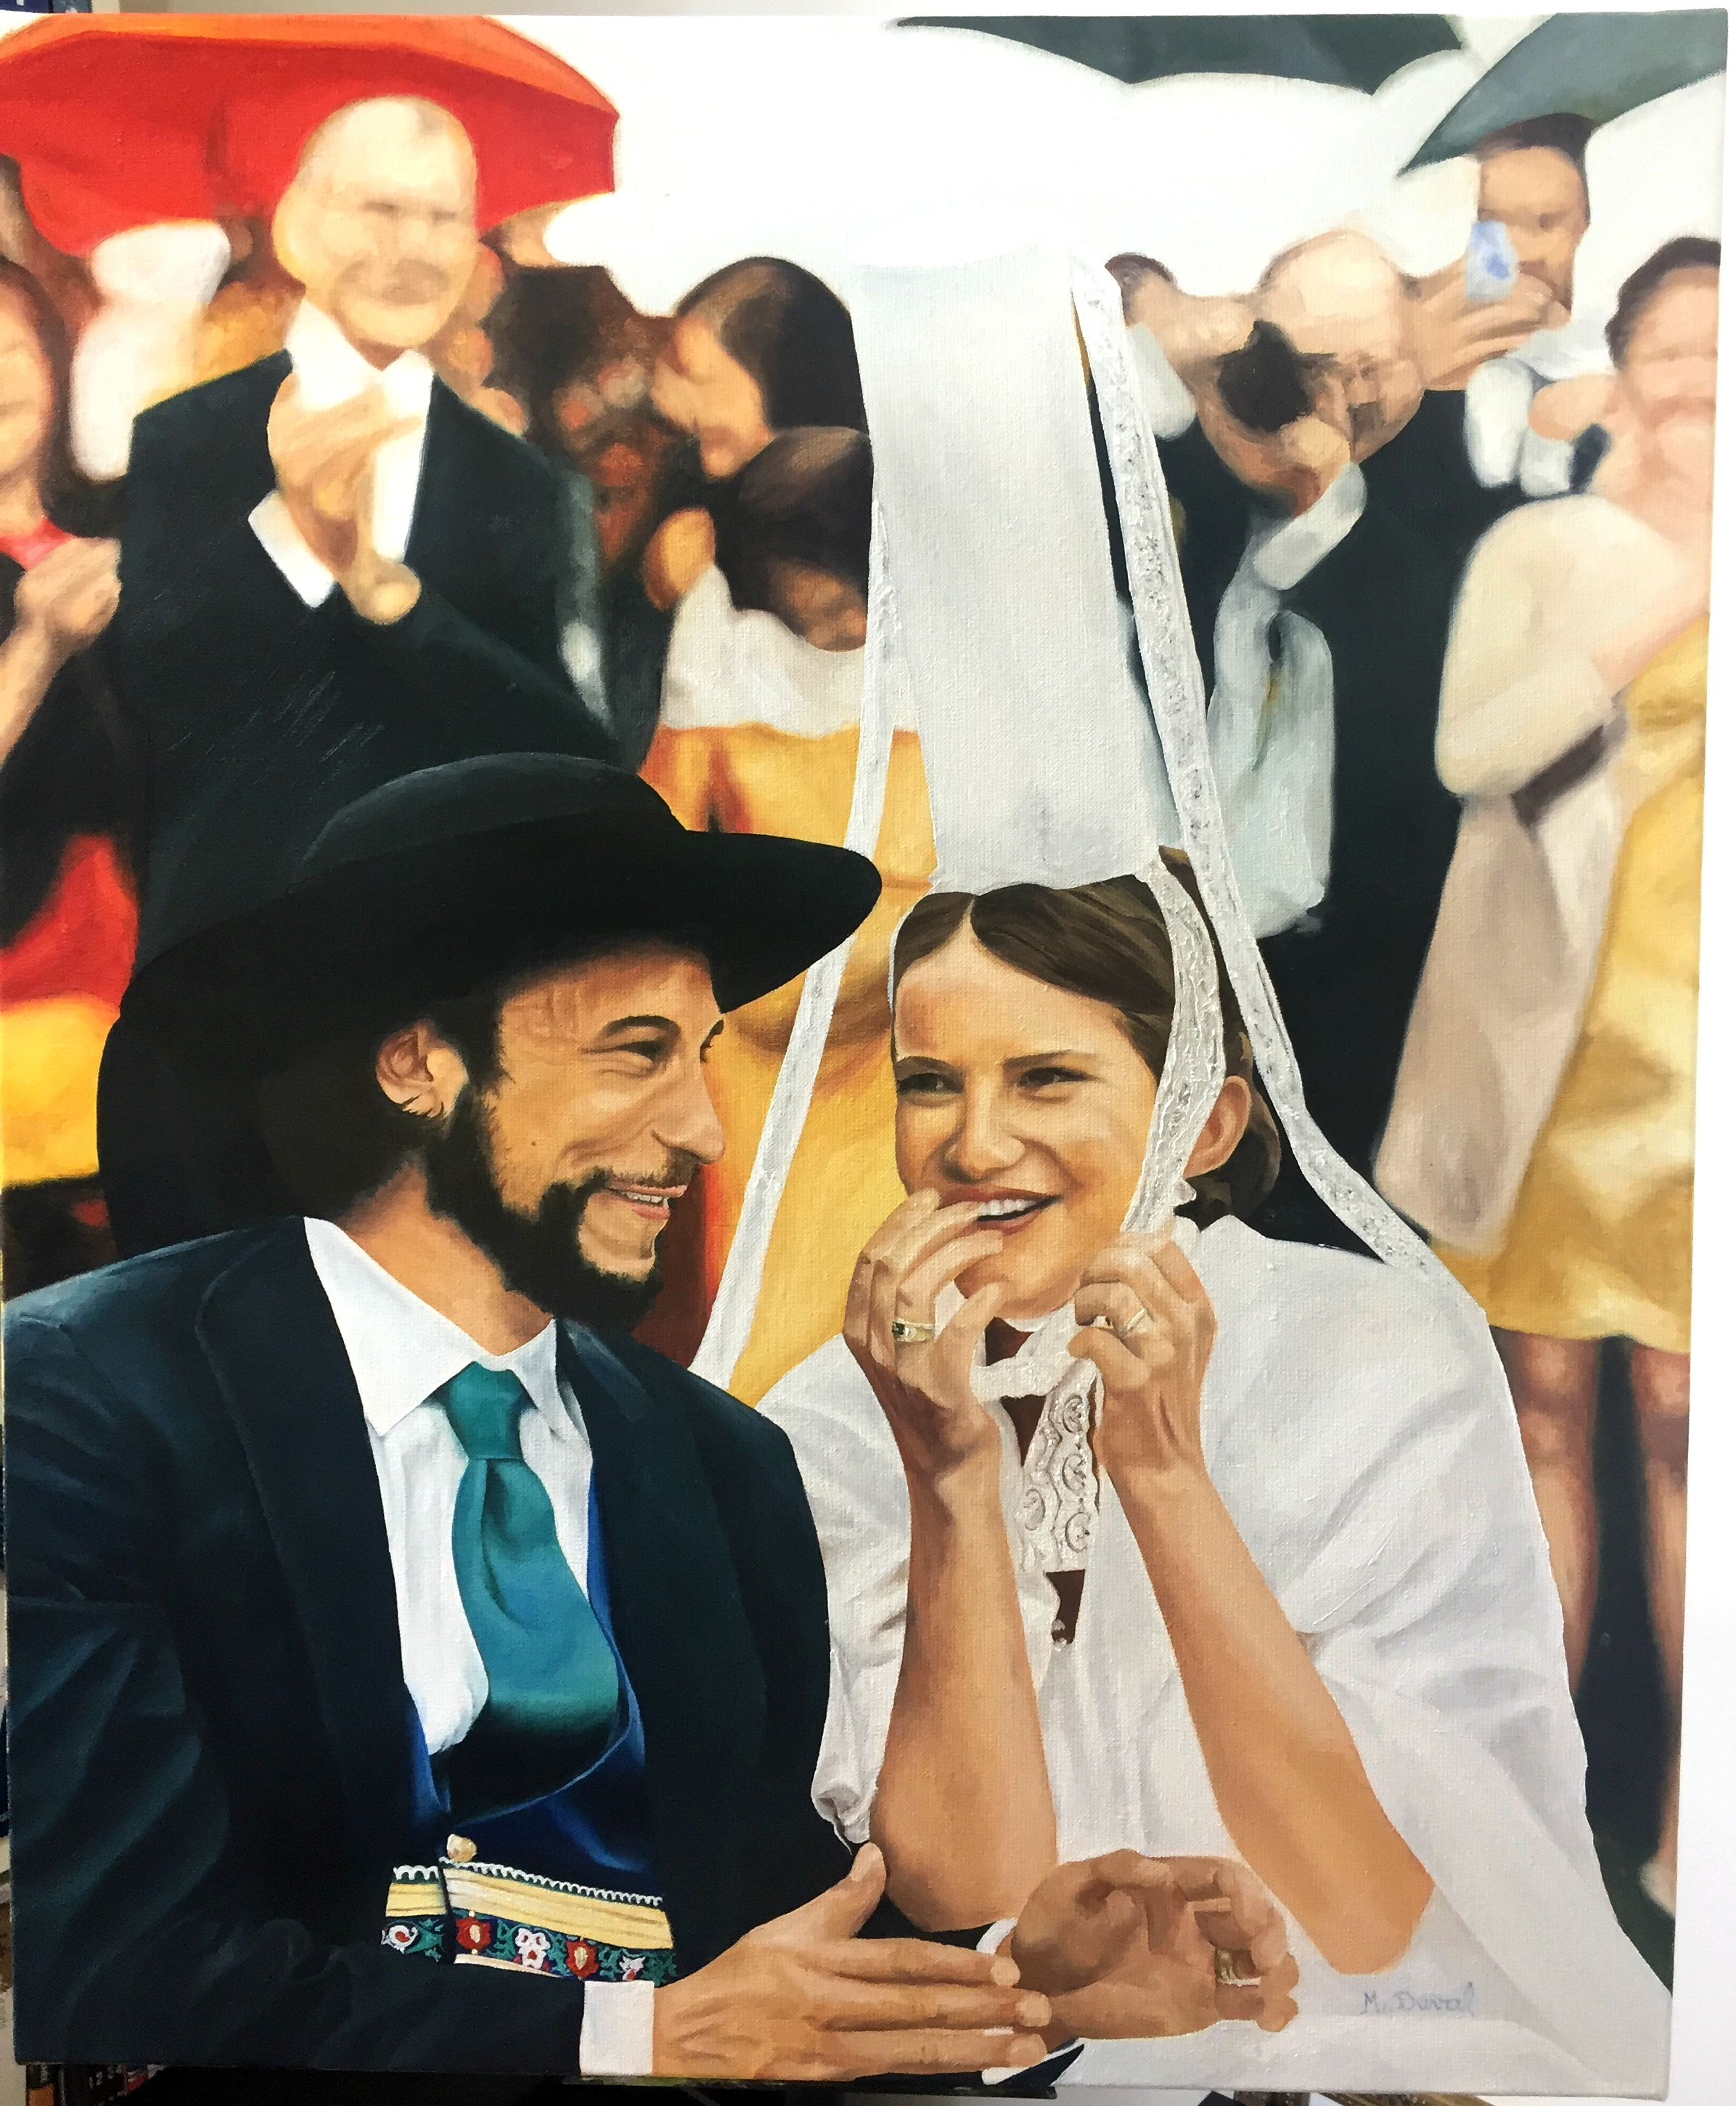 Les mariés bretons